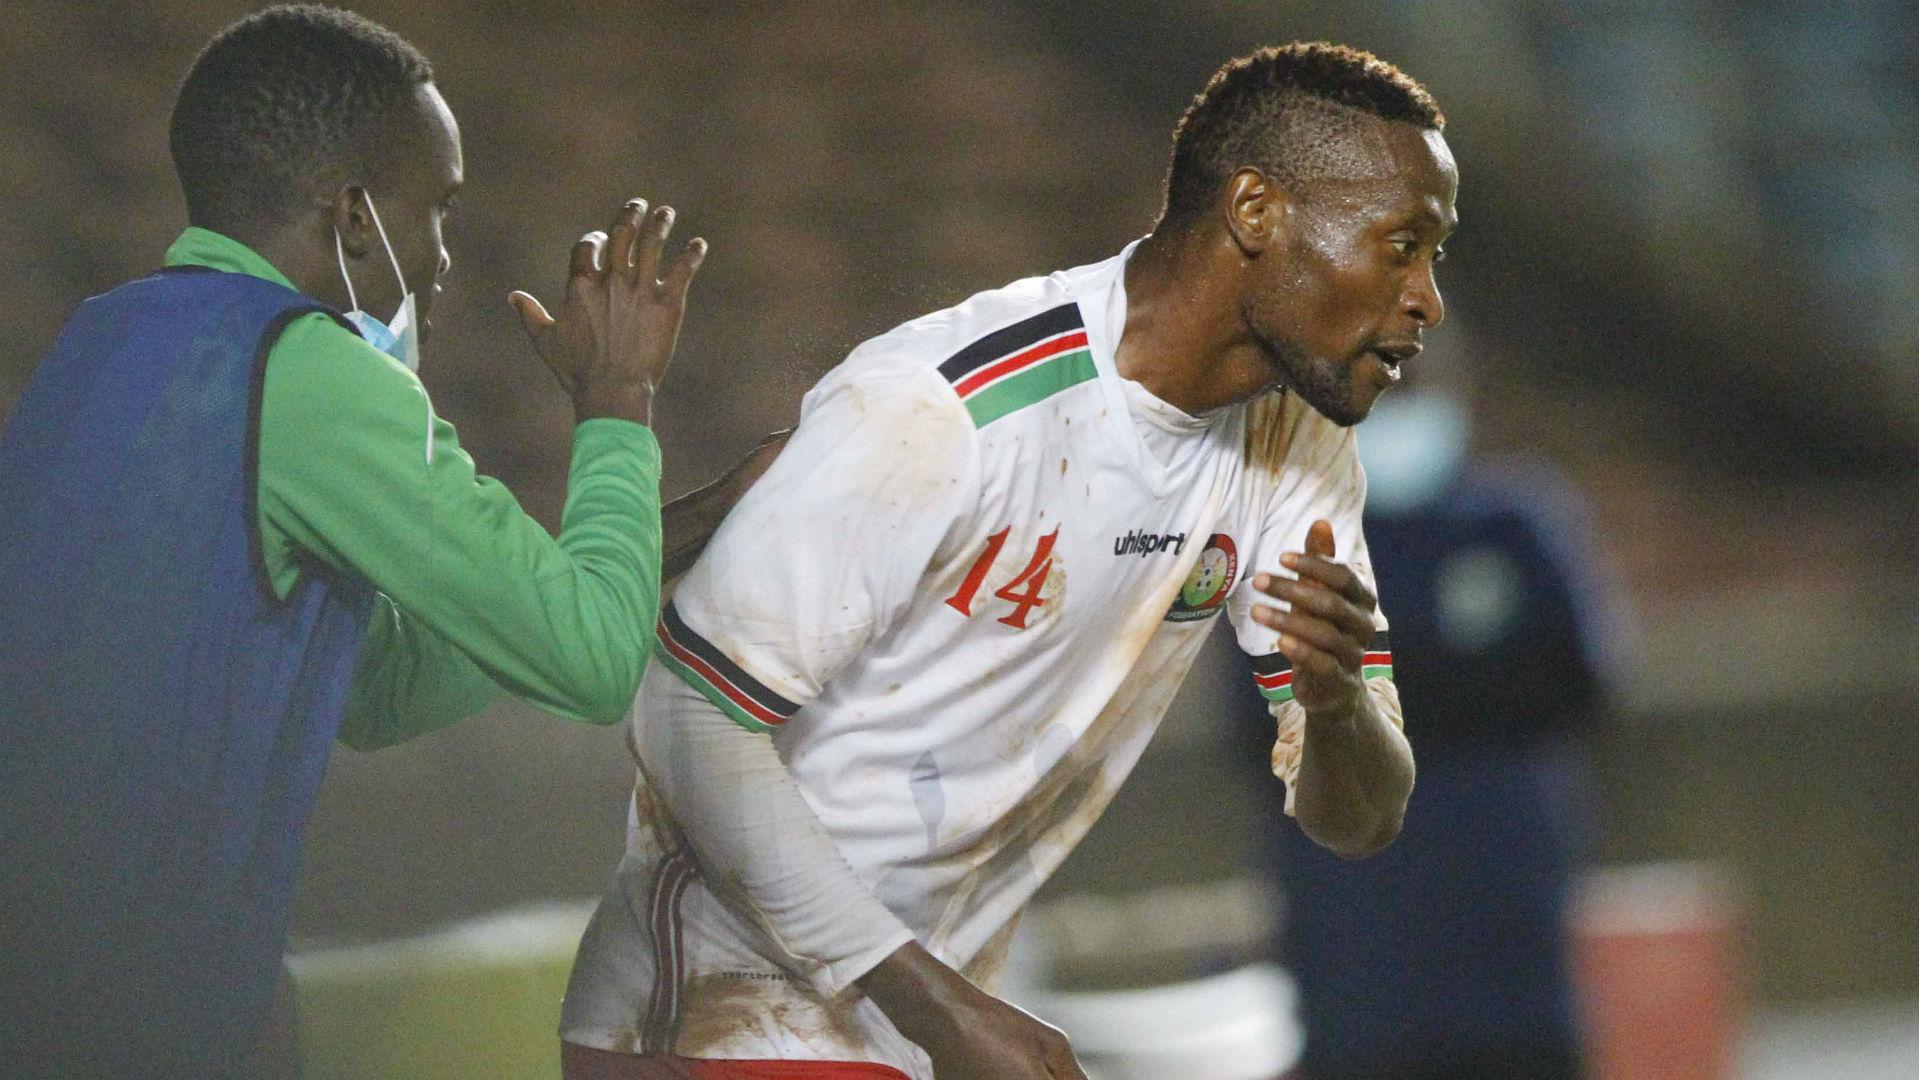 Masoud Juma: Harambee Stars forward set for Difaa El Jadida move from JS Kabylie - Reports